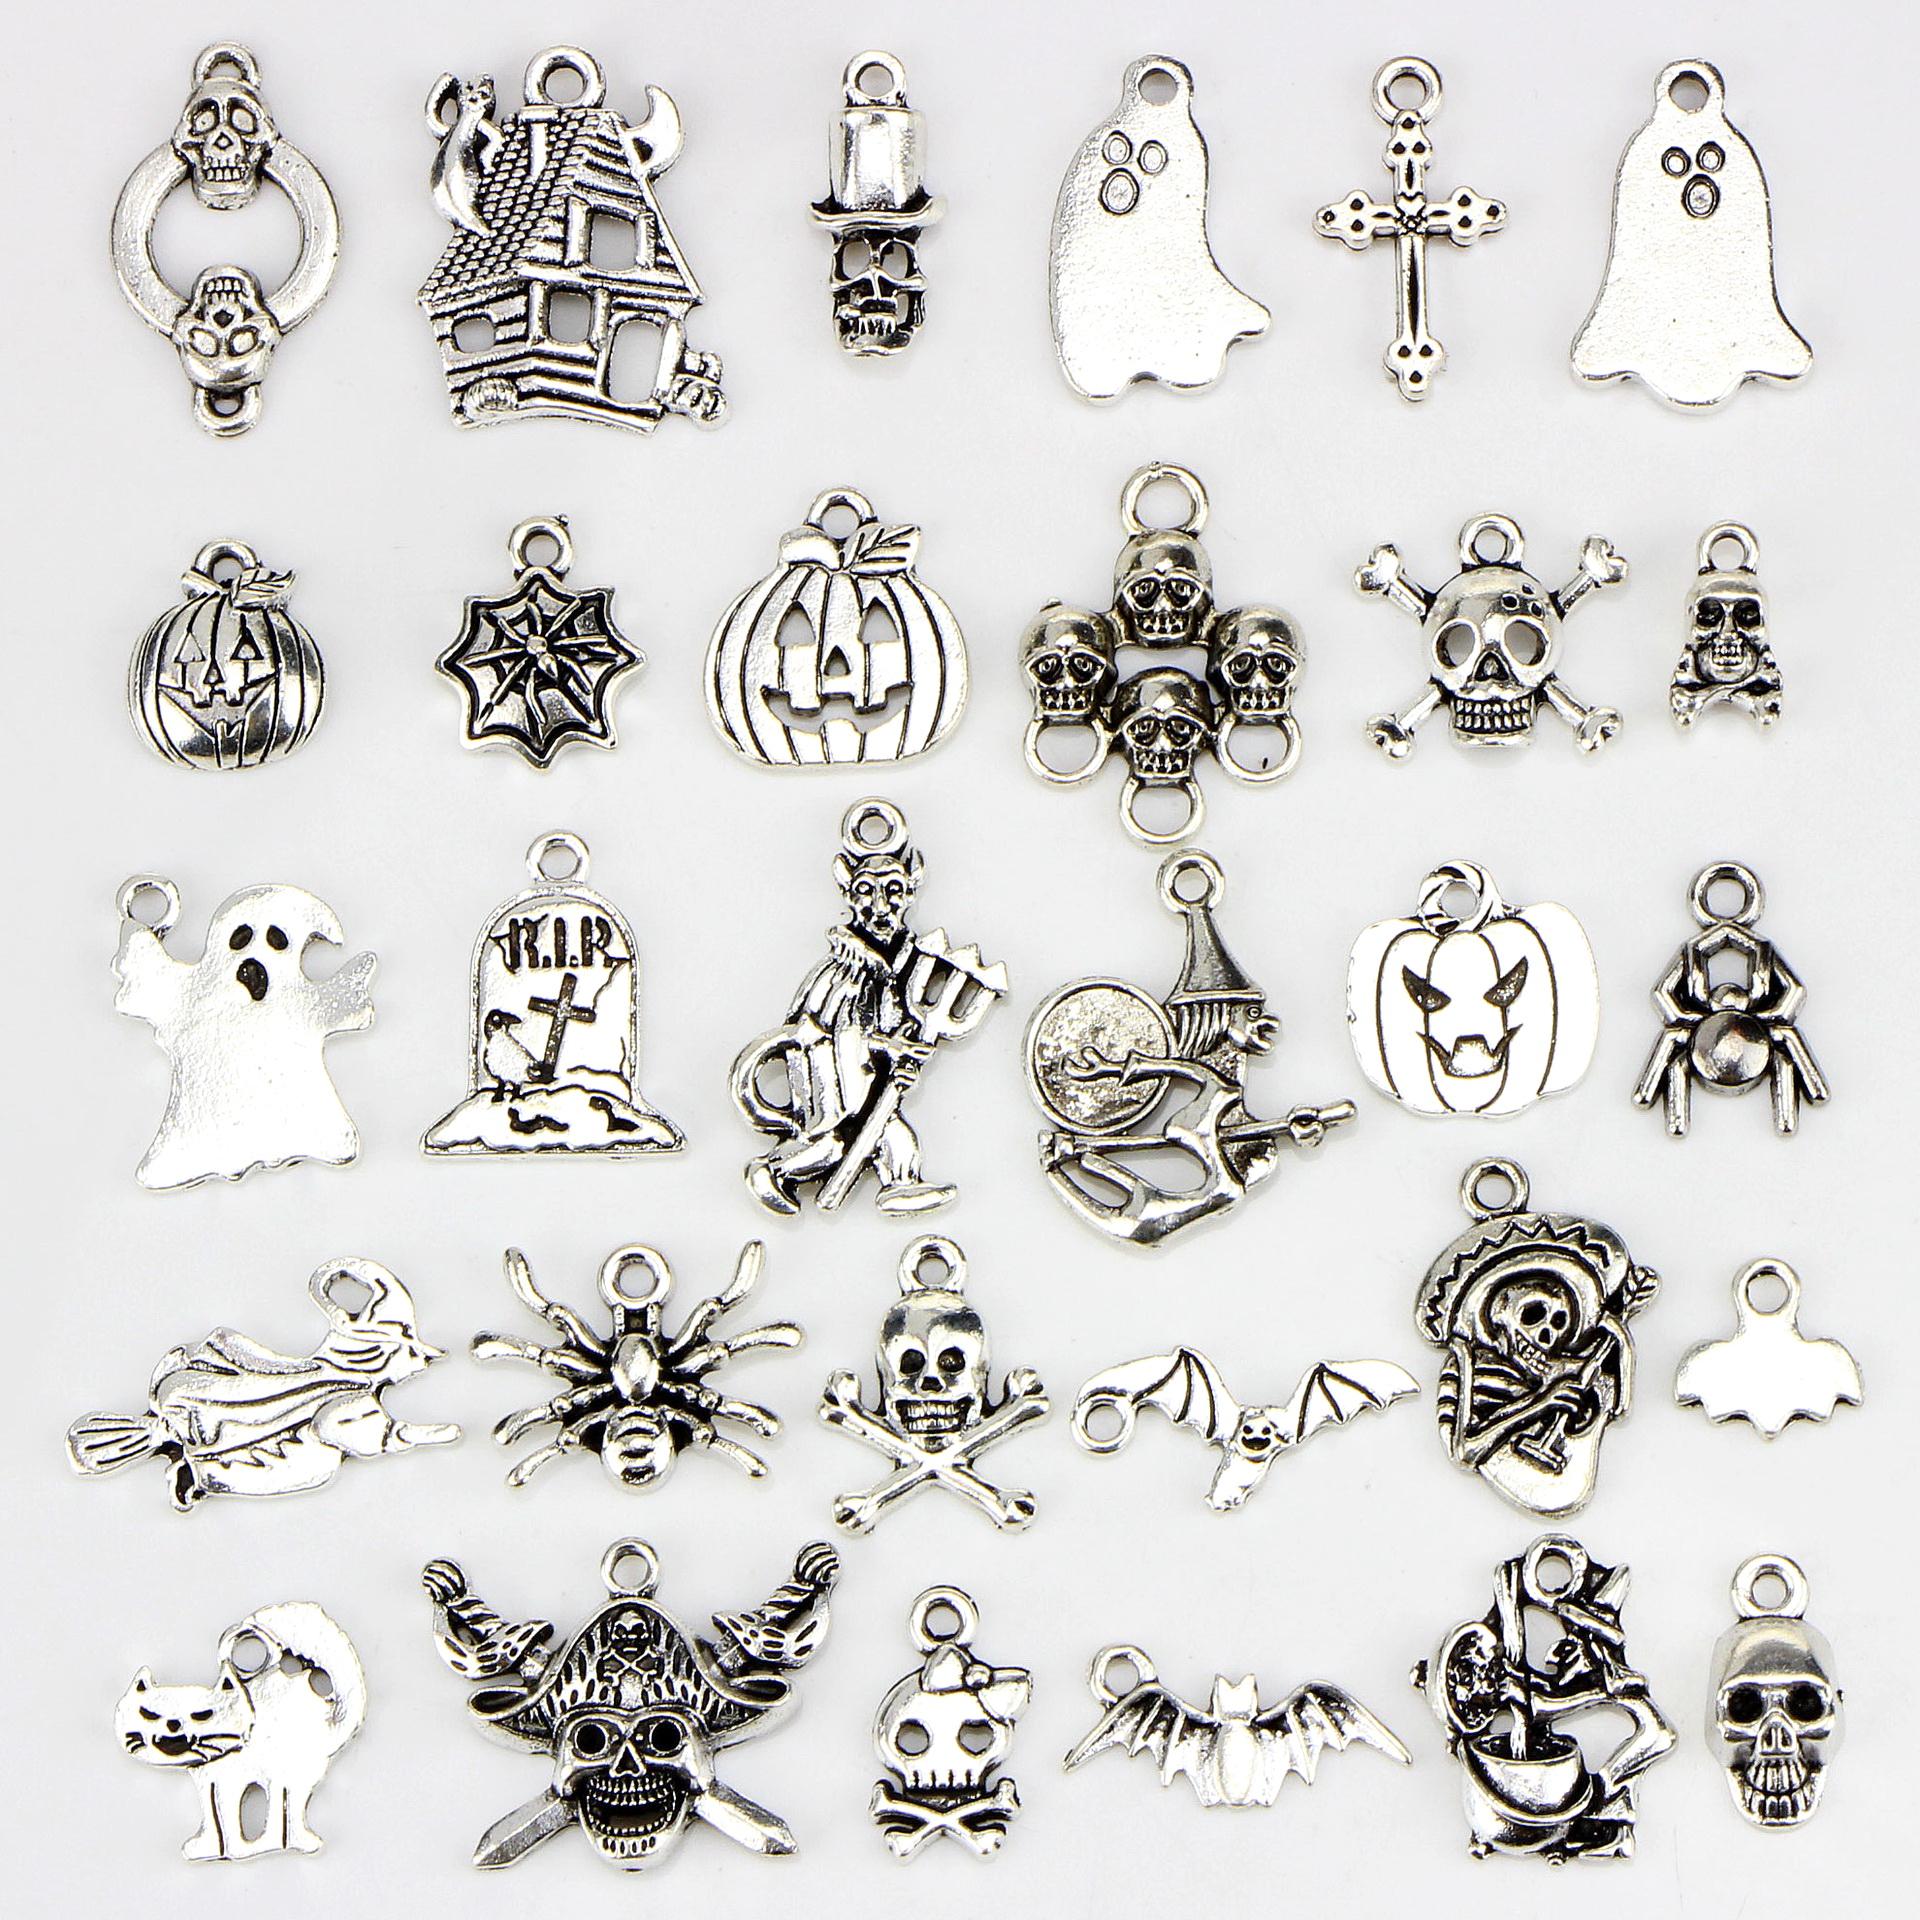 Gecko Charm//Pendant Tibetan Antique Silver 23mm  10 Charms Accessory Jewellery